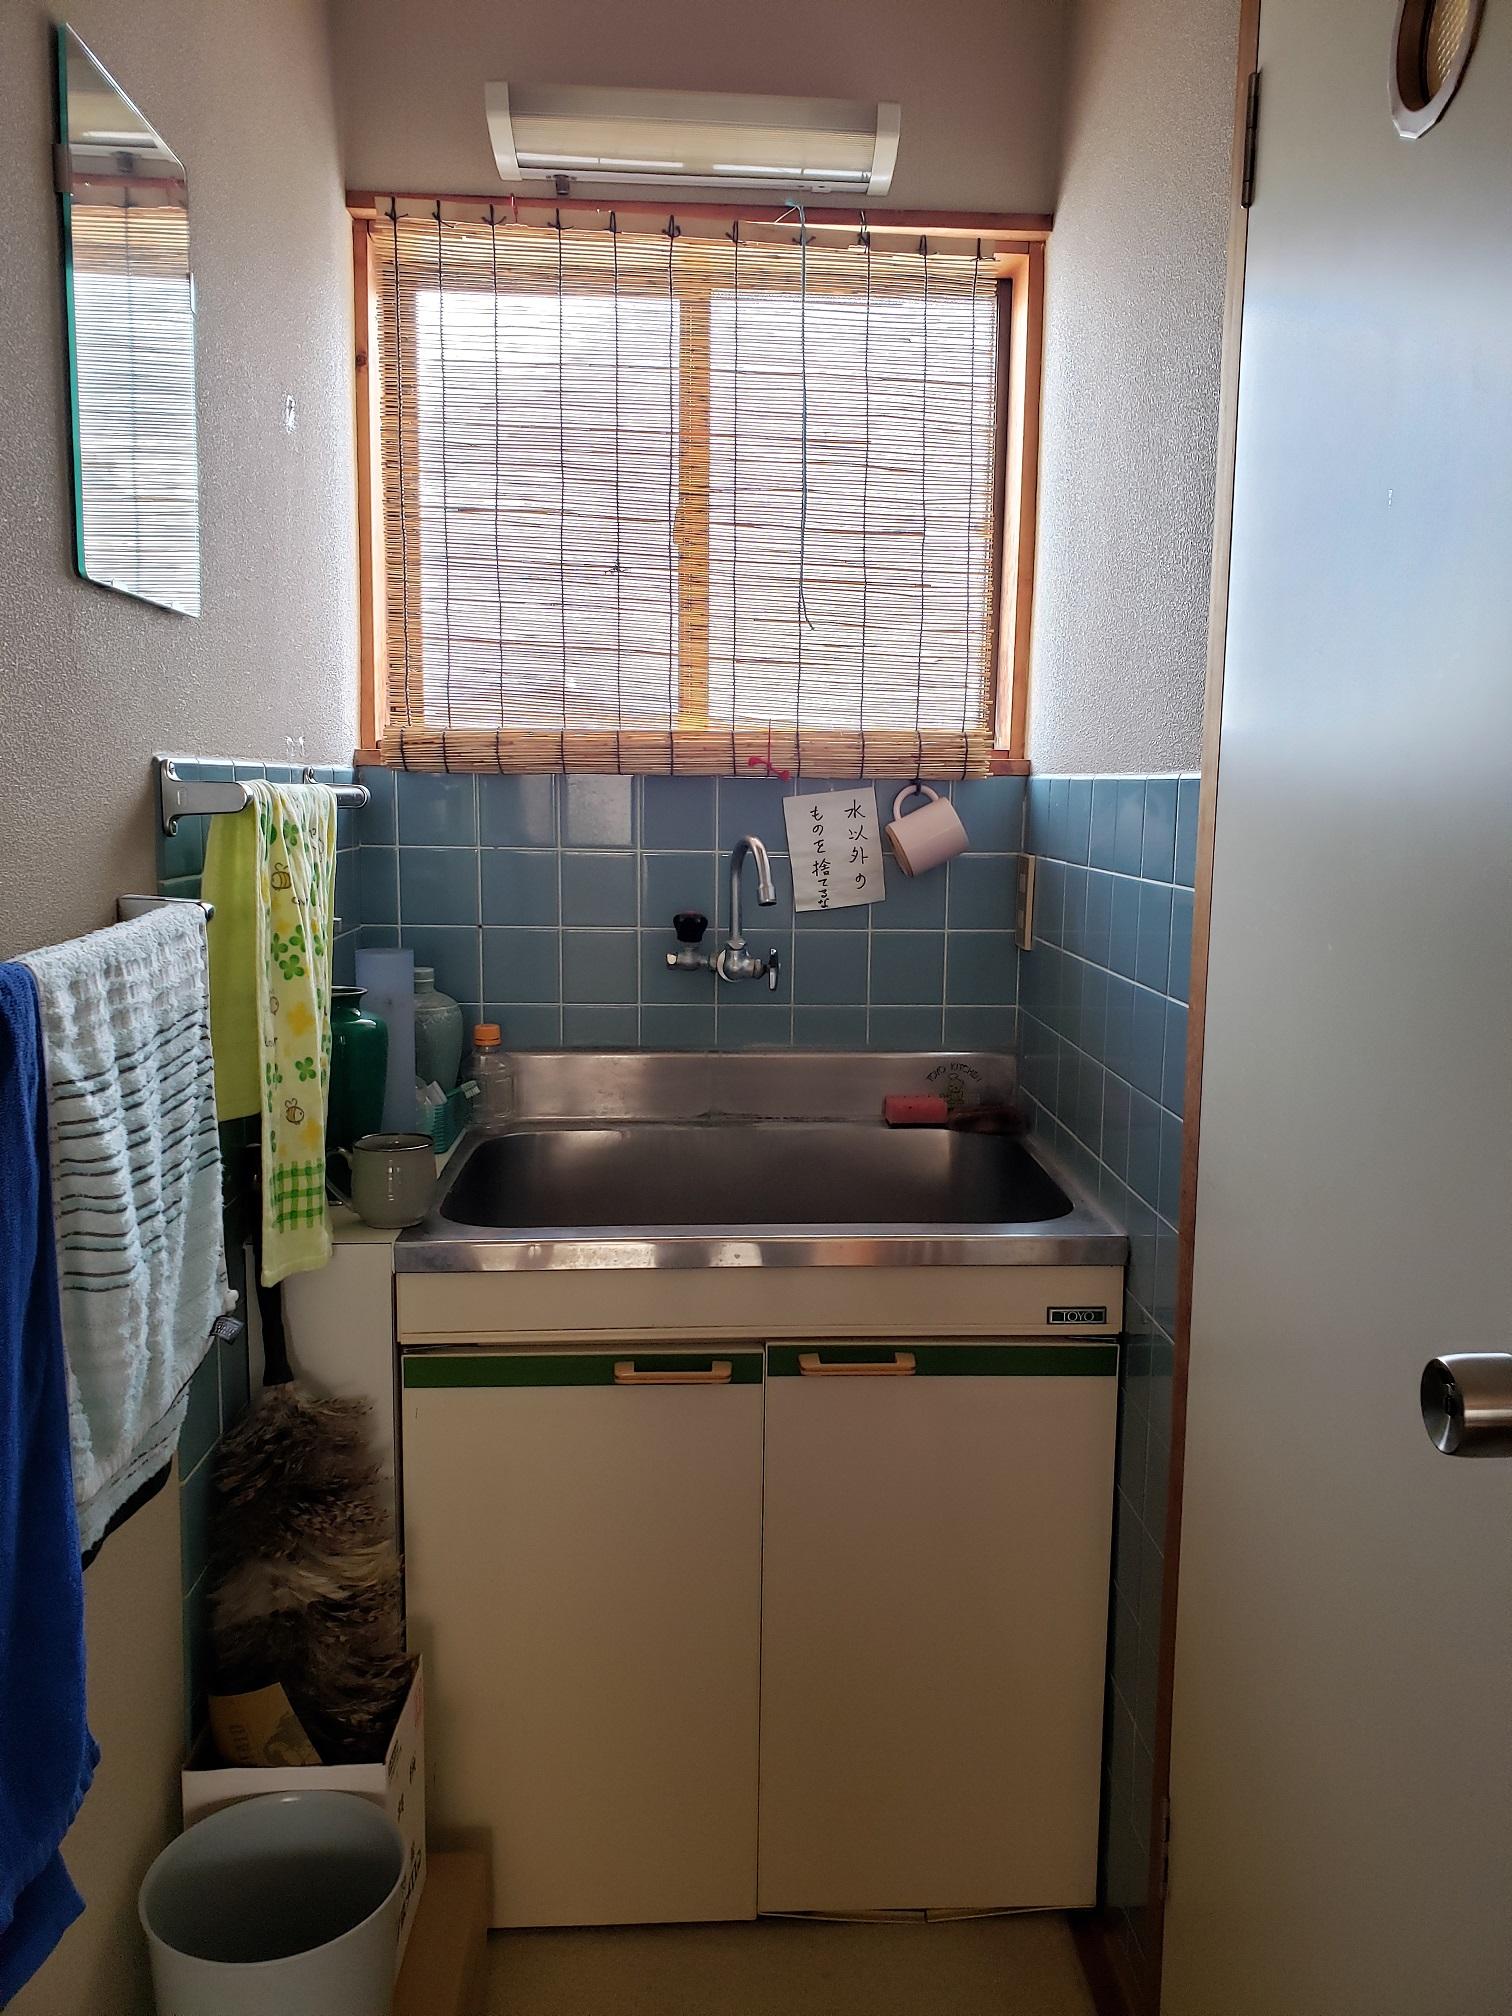 Before 老朽化してきた洗面台